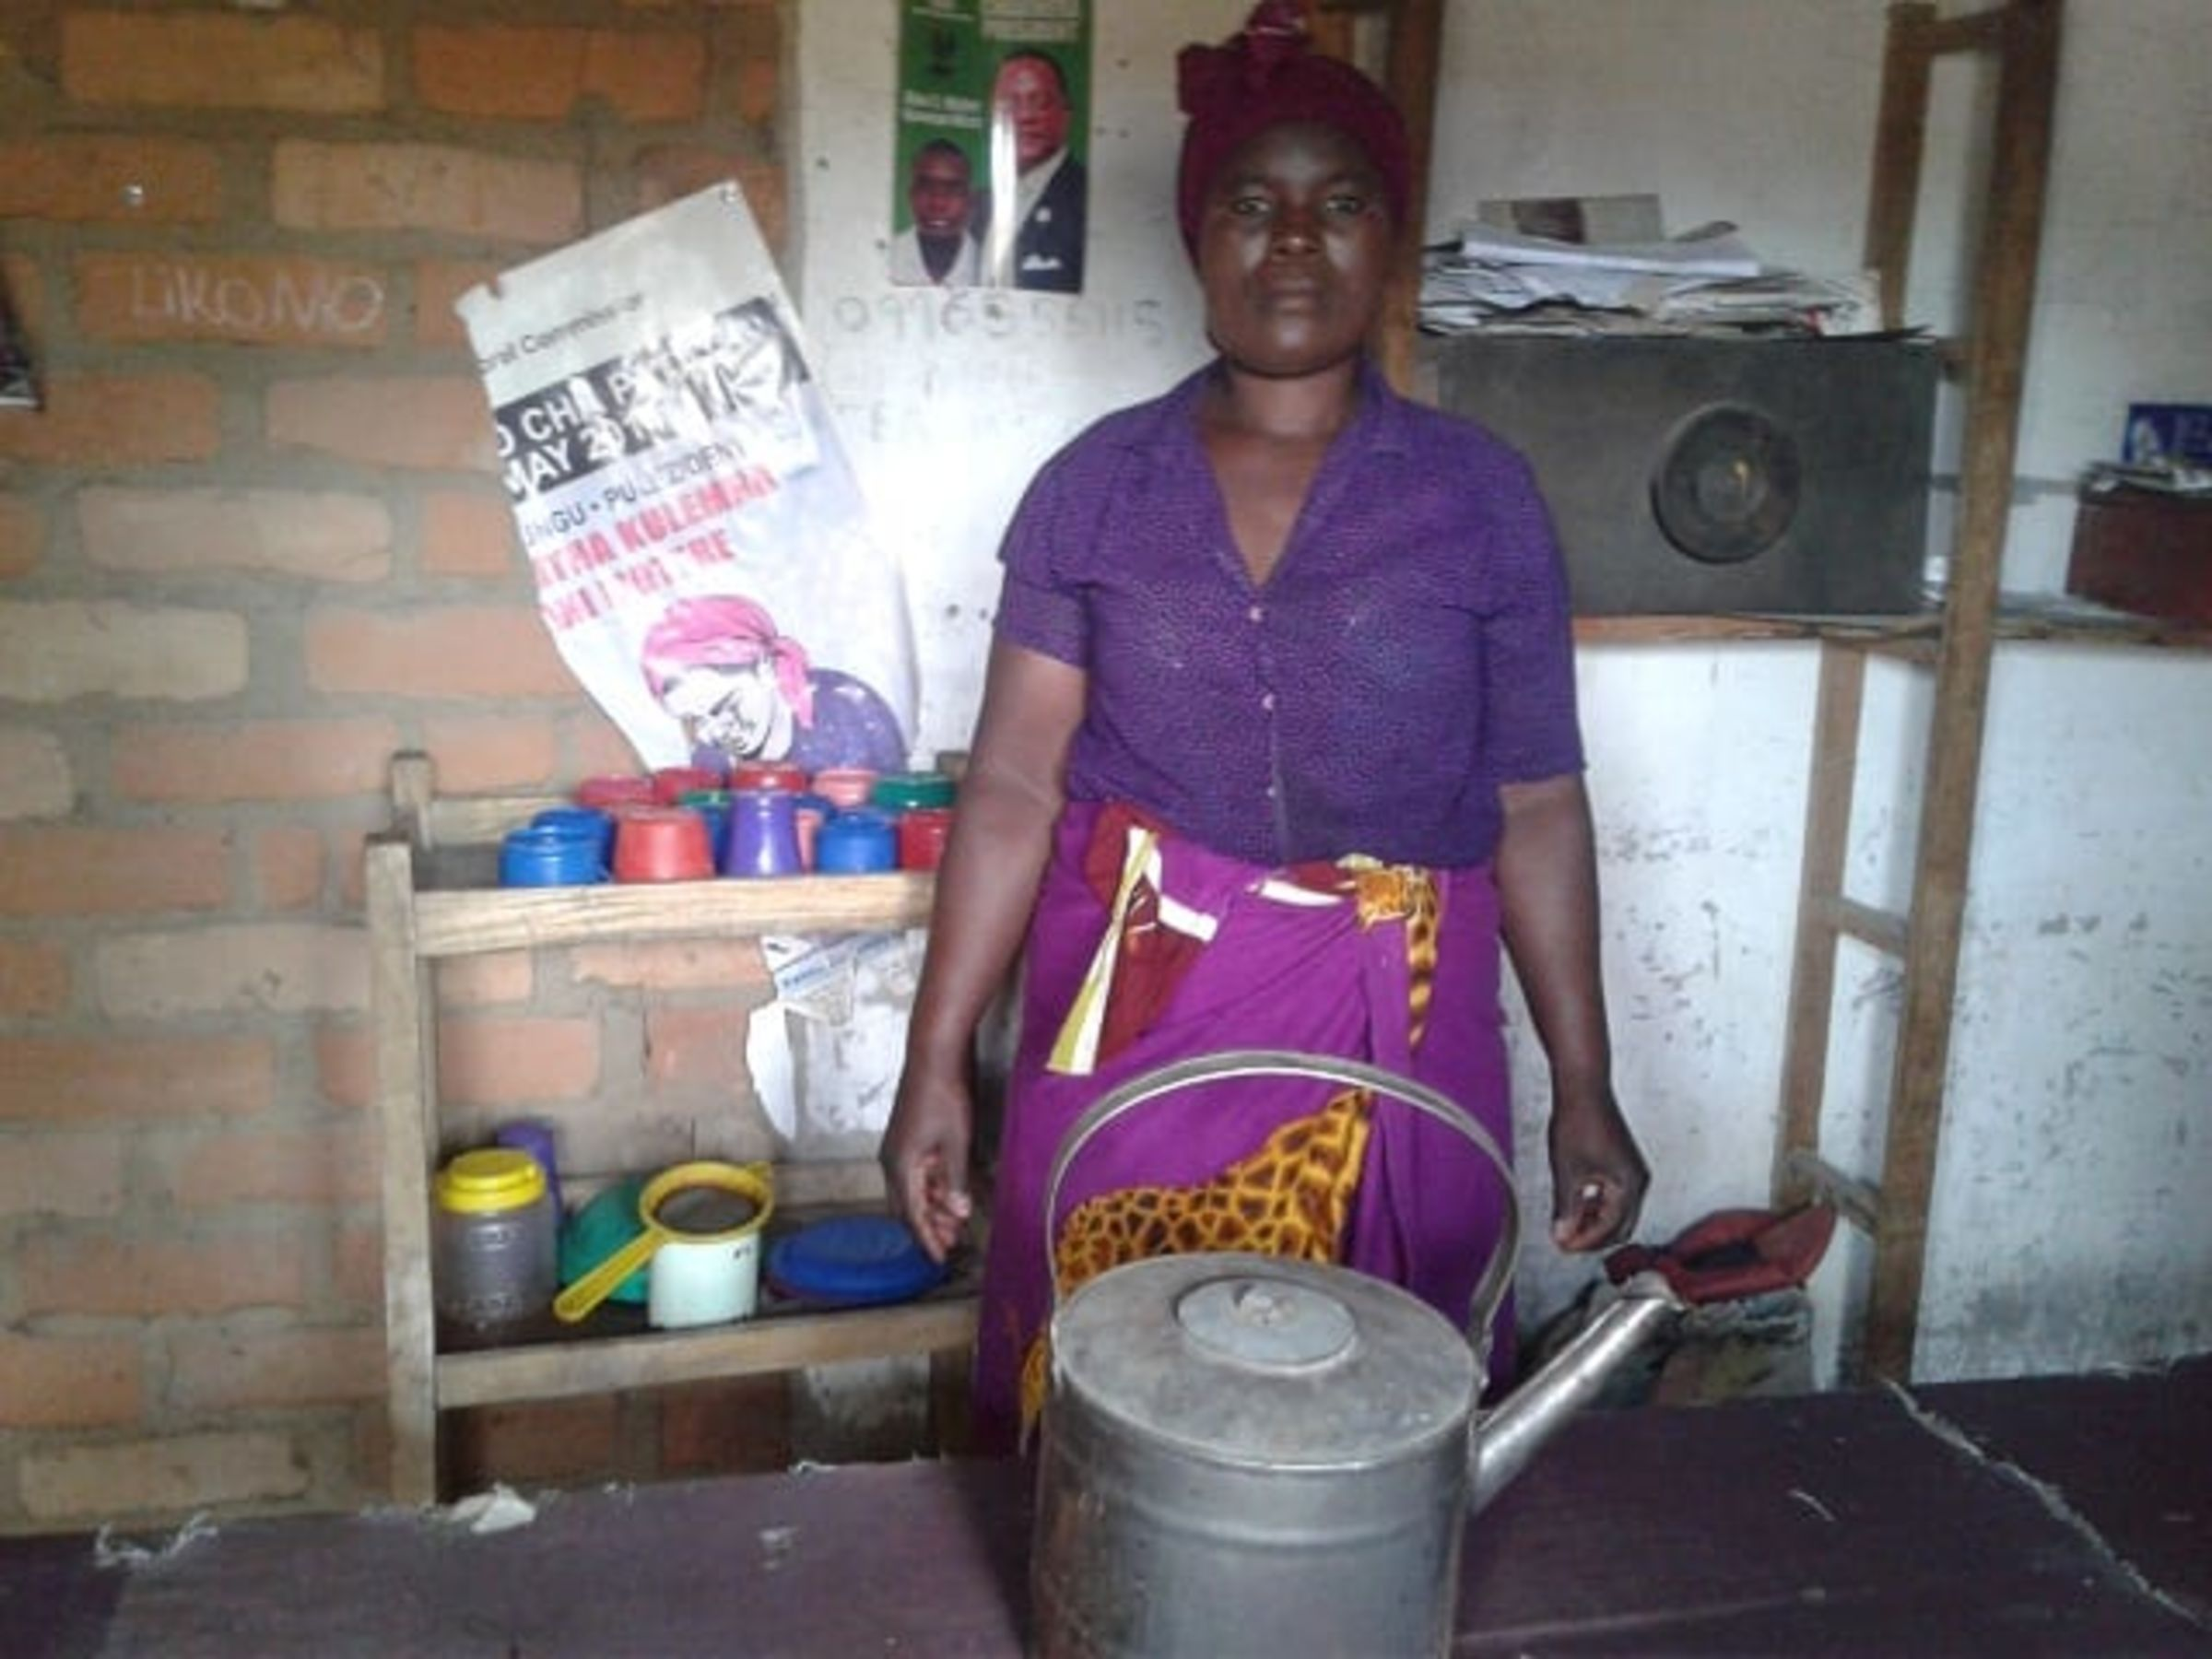 Alix Bromley Pics microfinance from care international uk